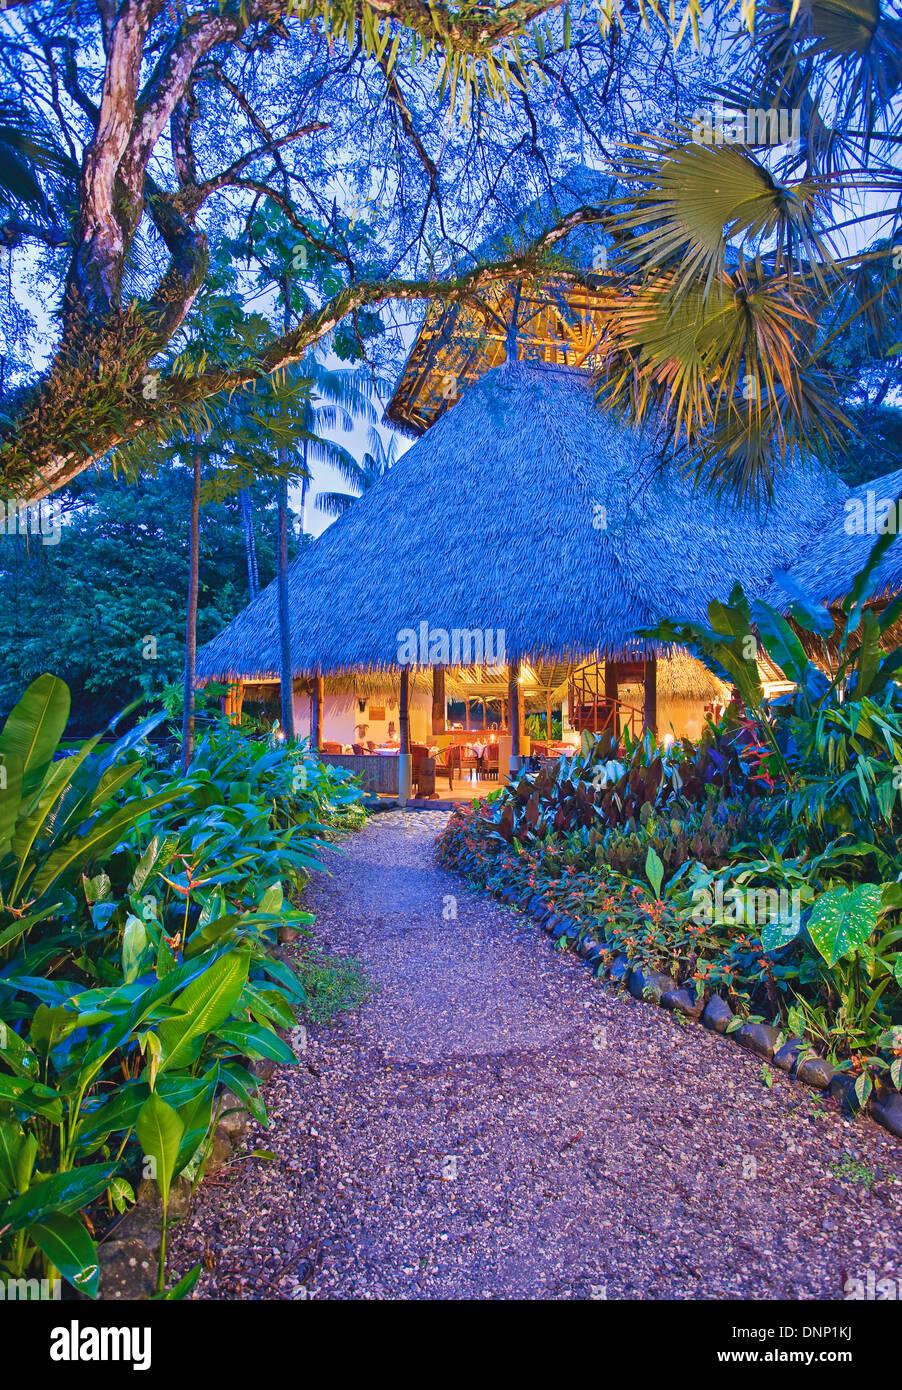 Exterior of main lodge at Lapa Rios, Costa Rica - Stock Image